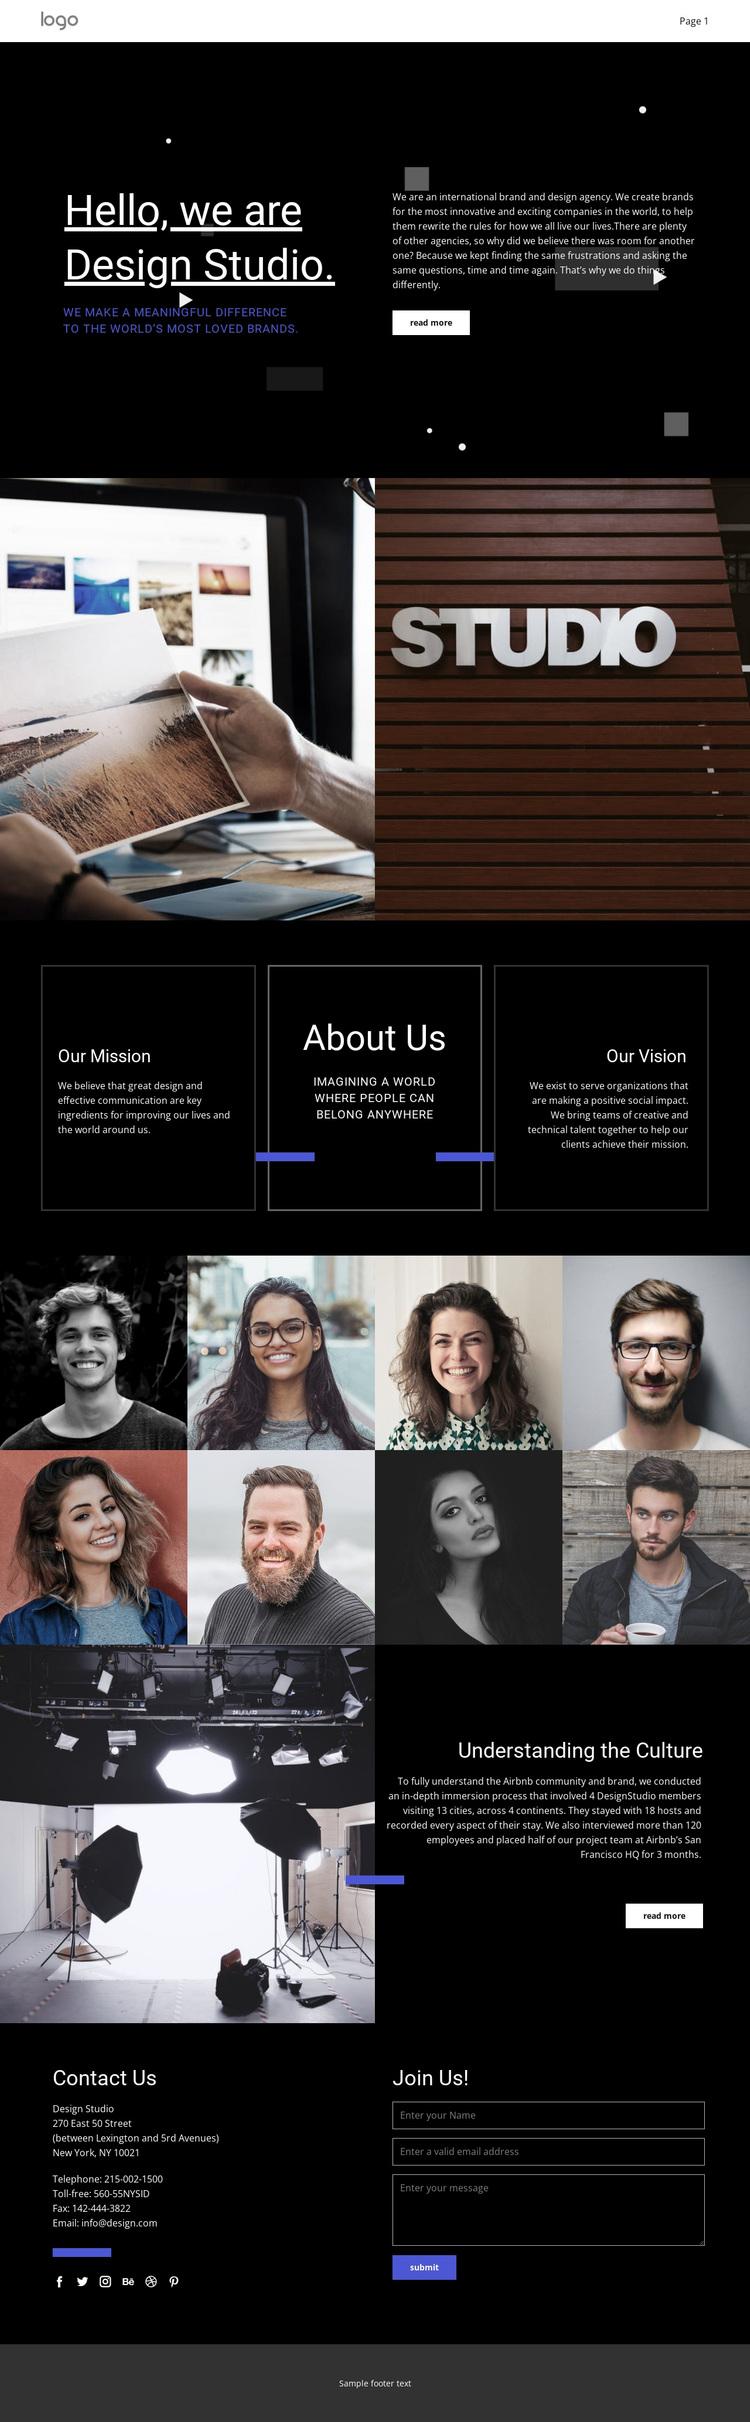 Our design is unique Joomla Page Builder